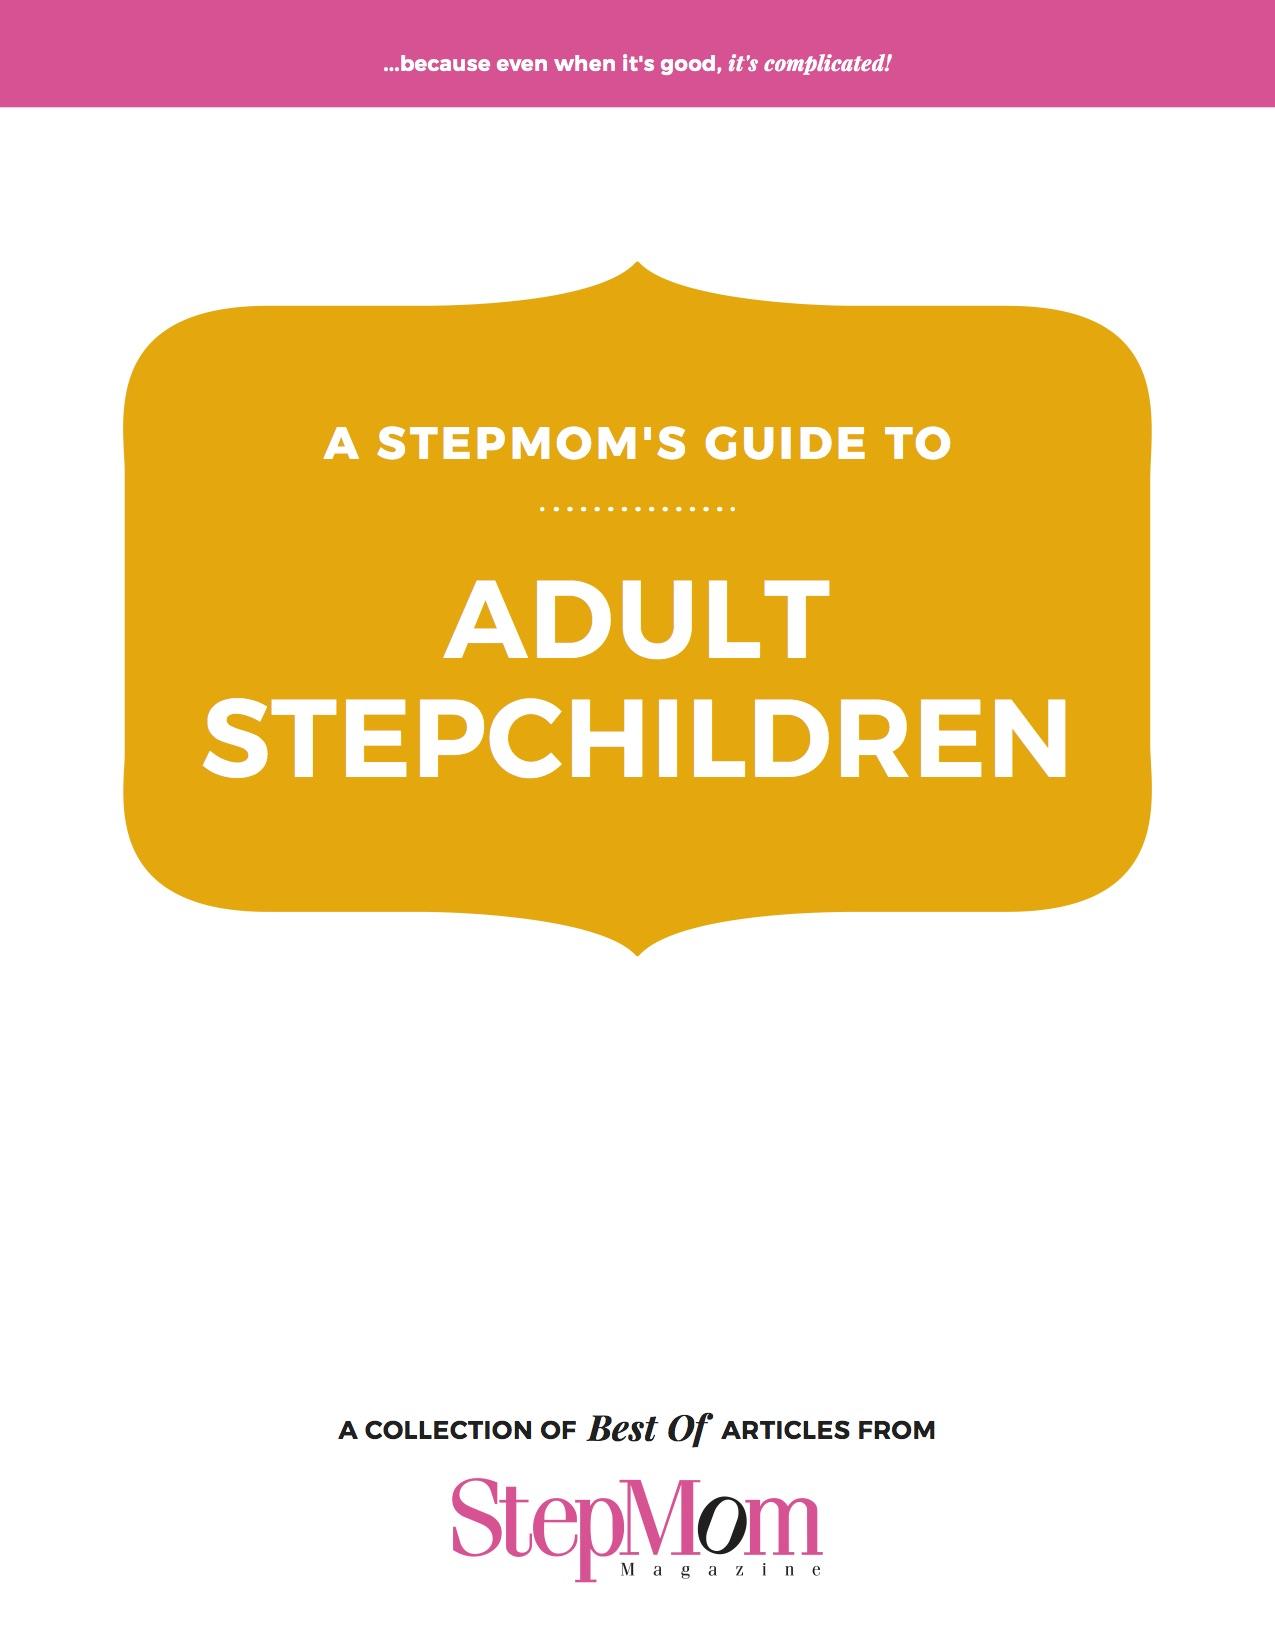 Adult Stepchildren